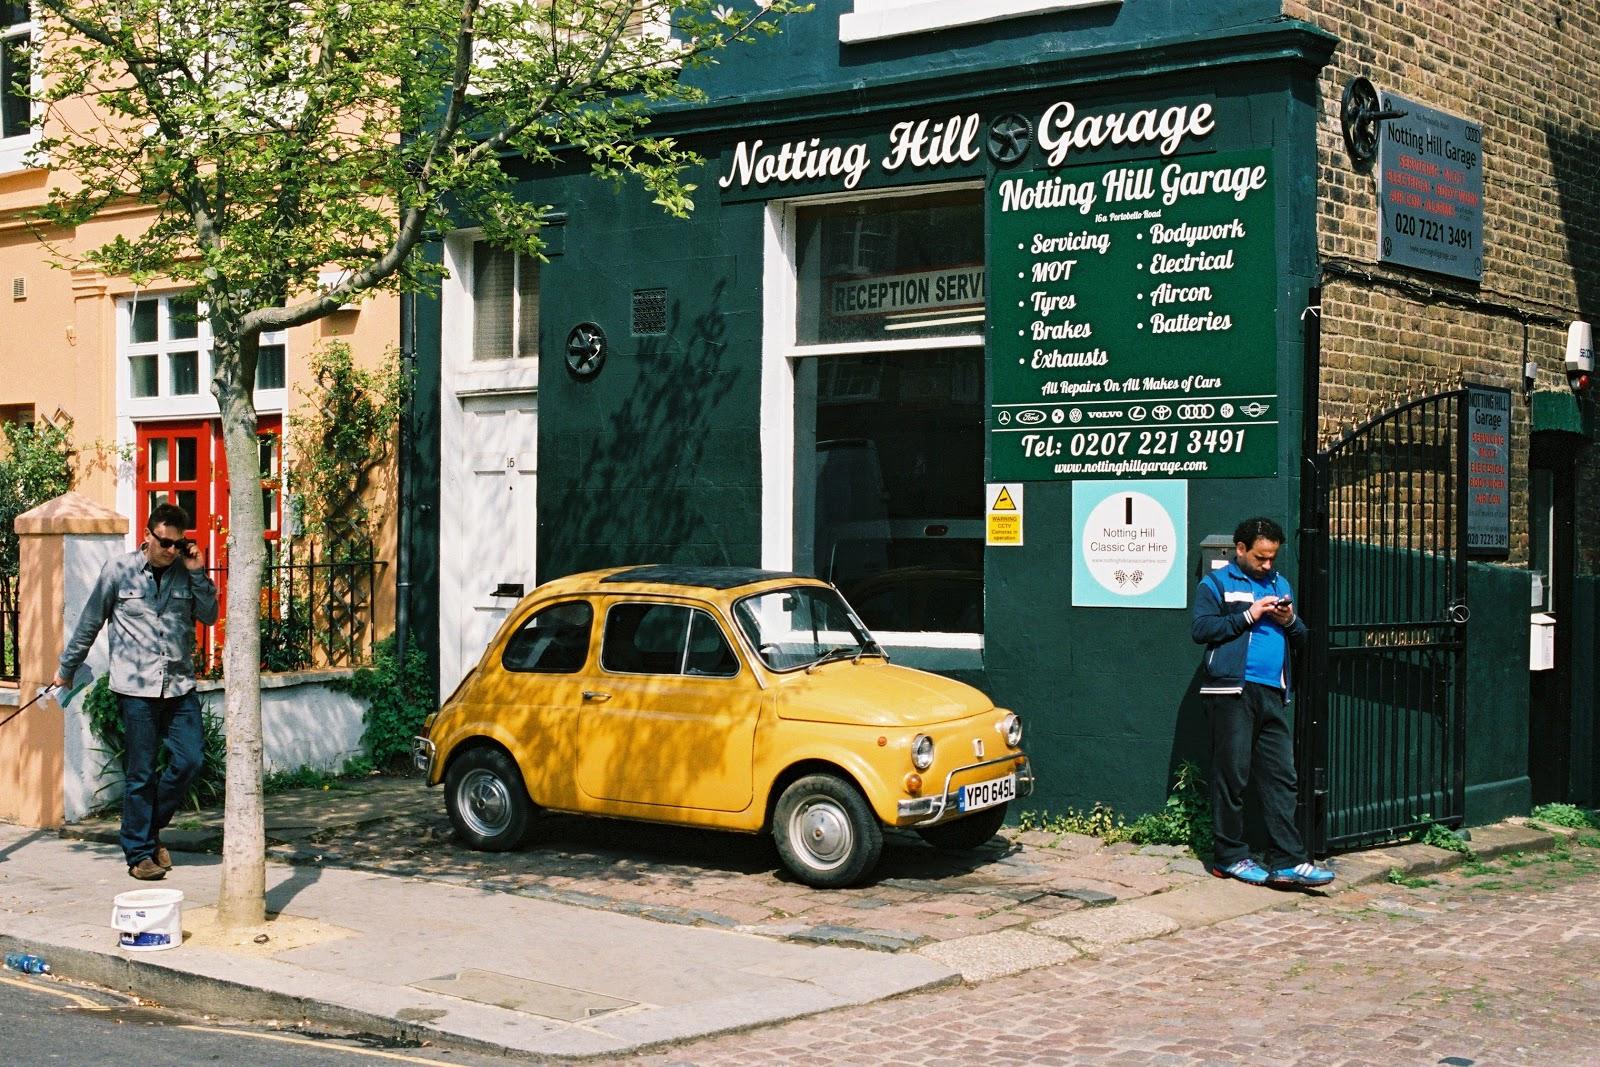 manu00 notting hill petit garage pour petite voiture. Black Bedroom Furniture Sets. Home Design Ideas